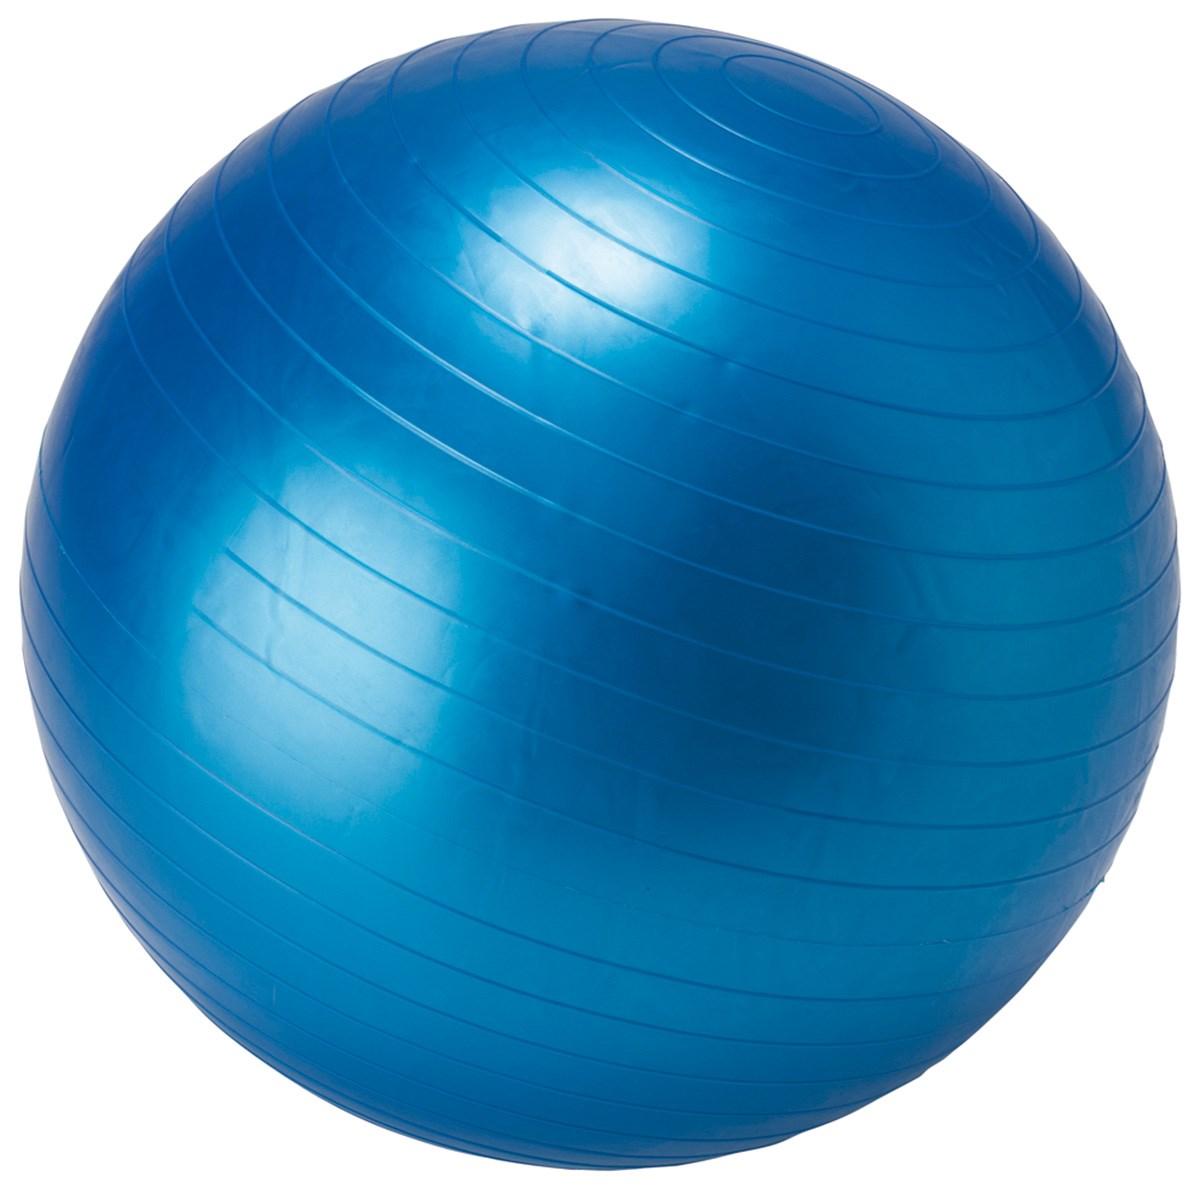 IDEAL BODY フィットネスボール 65cm ブルー